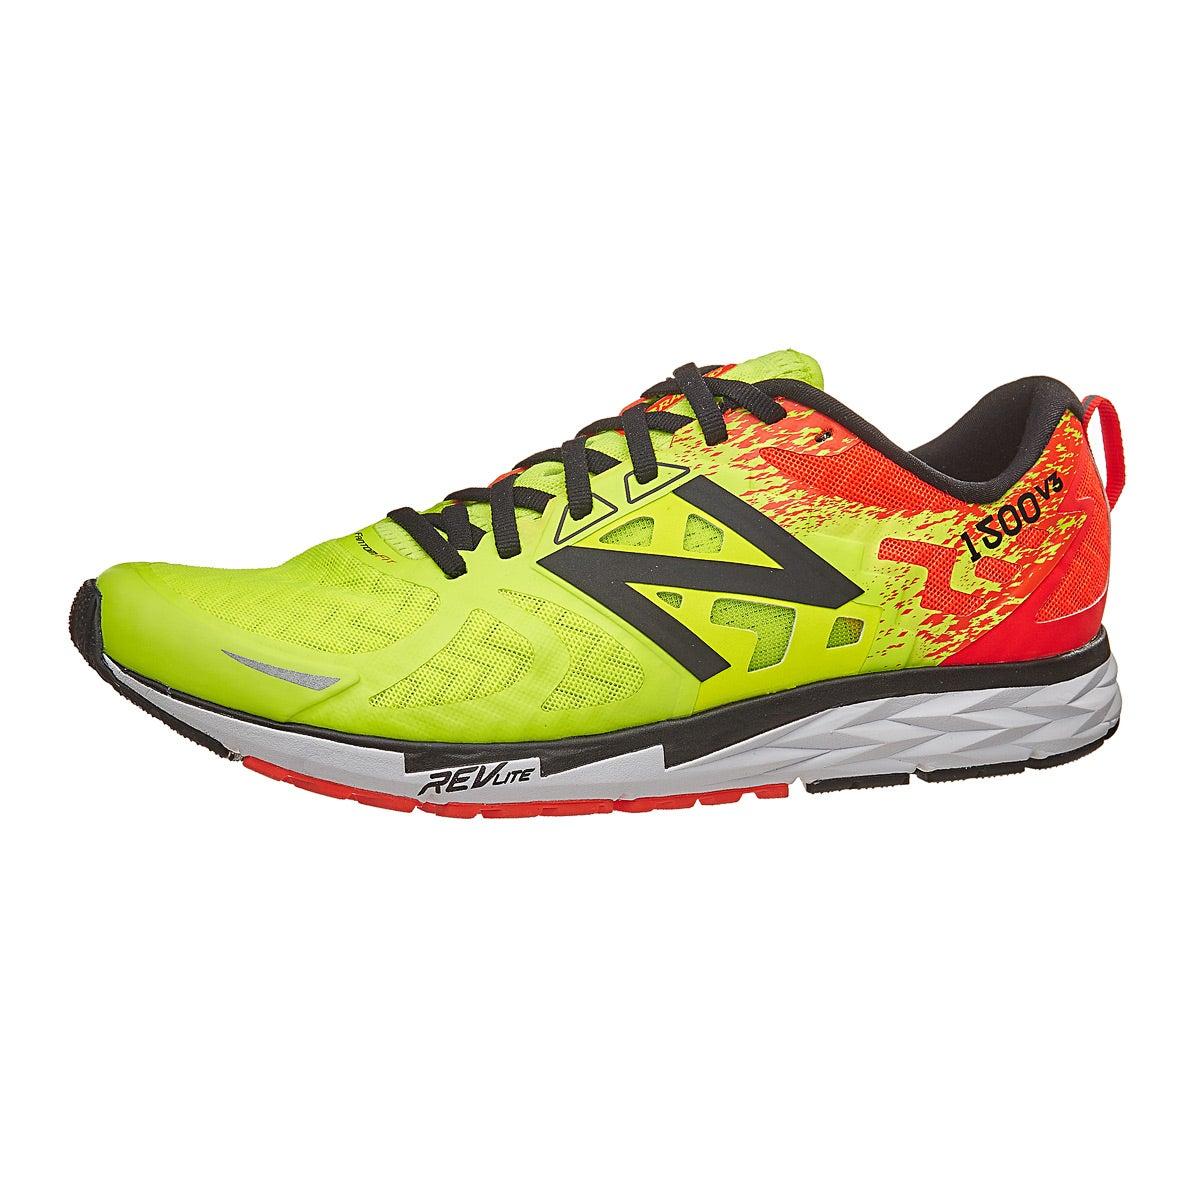 New Balance 1500 v3 Men's Shoes Lime Glo/Orange 360° View | Running ...